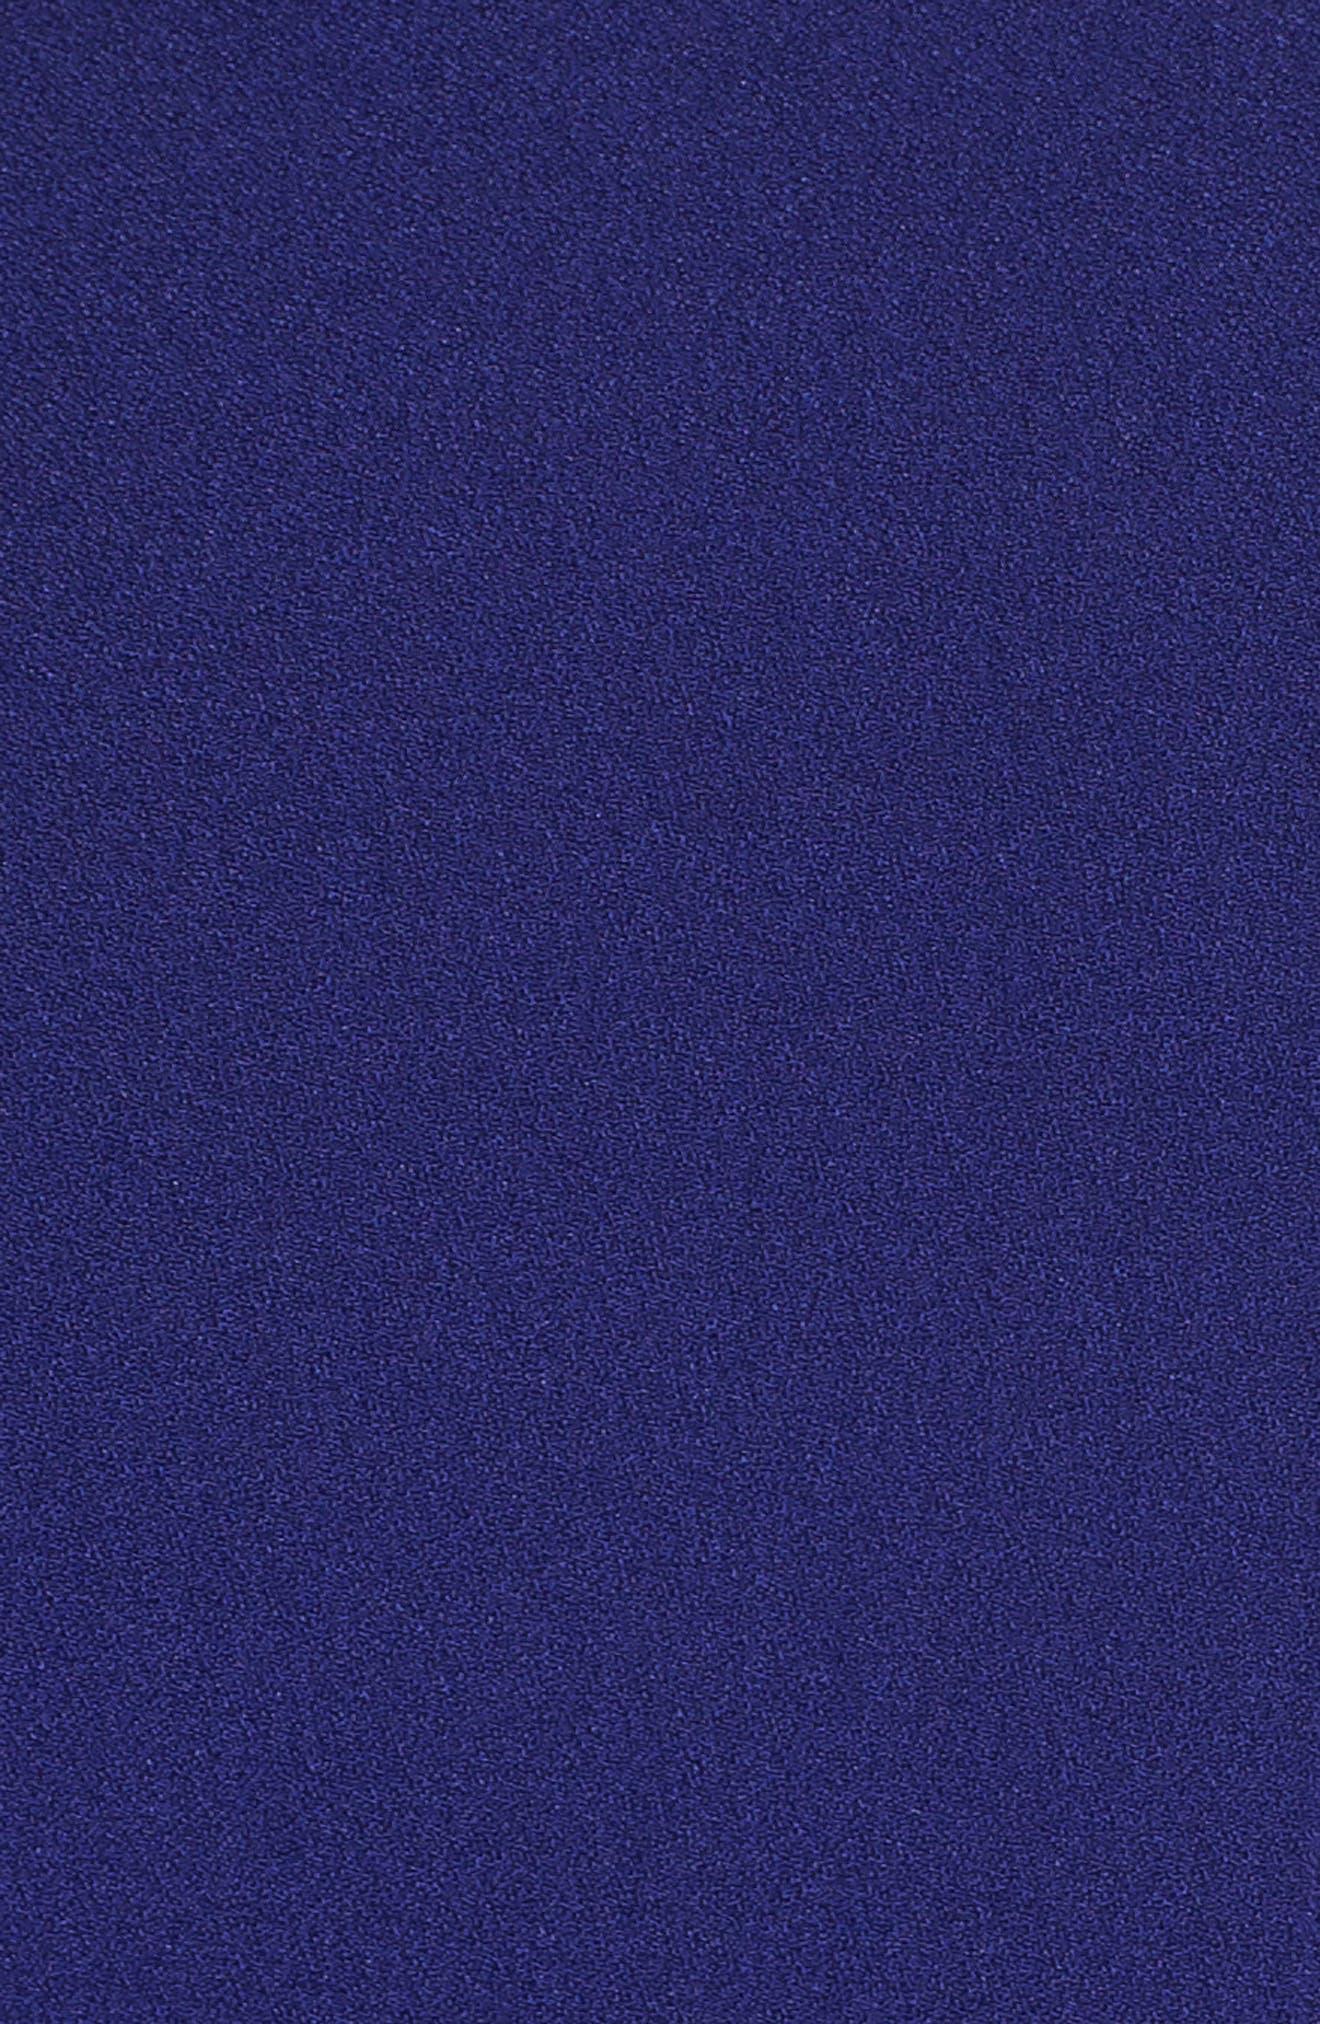 Tie-Shoulder Fit & Flare Dress,                             Alternate thumbnail 6, color,                             Cobalt